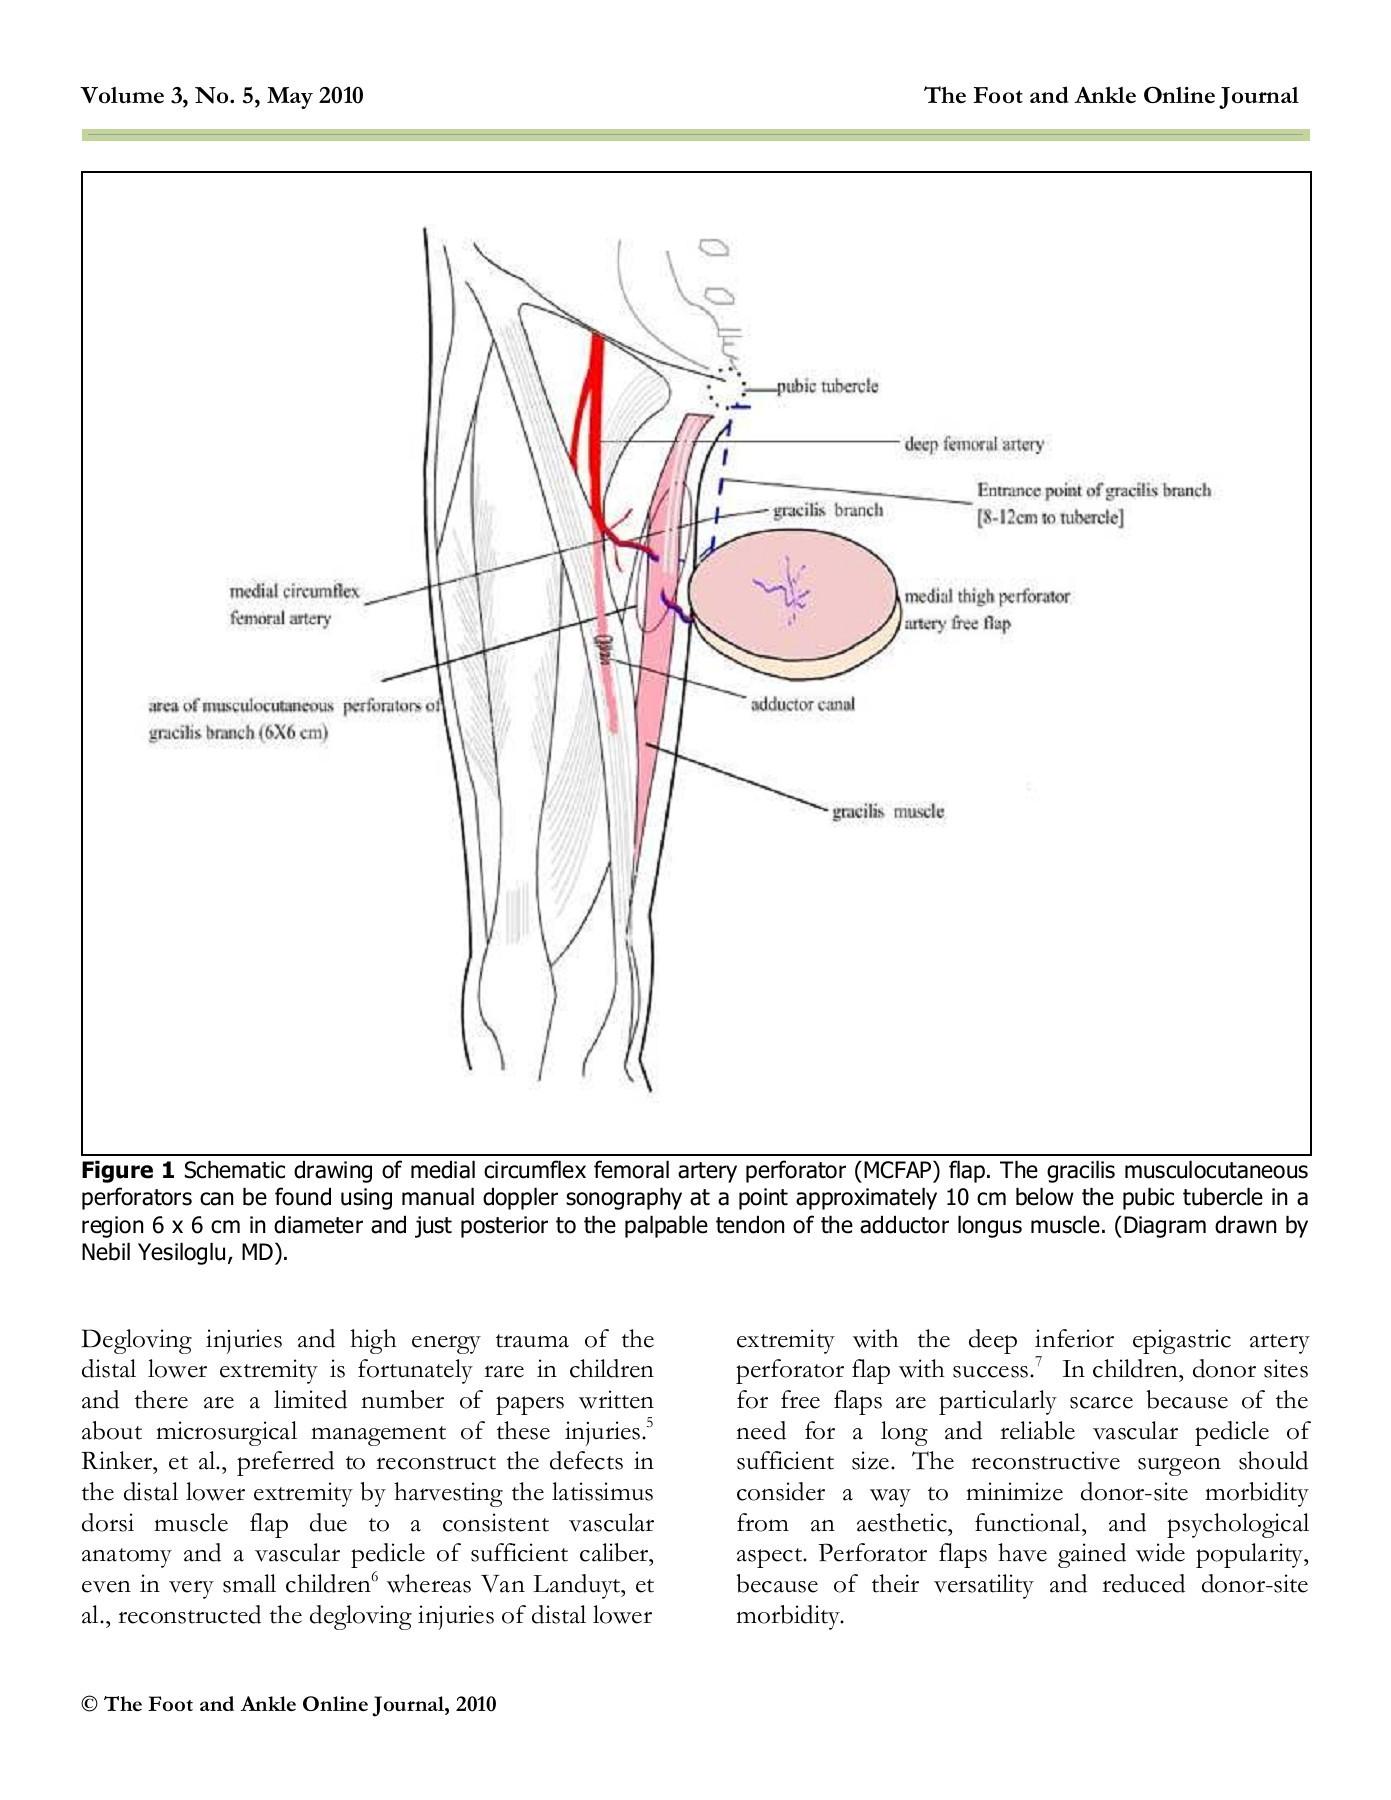 hight resolution of medial circumflex artery flap final wordpress com pages 1 6 text version fliphtml5